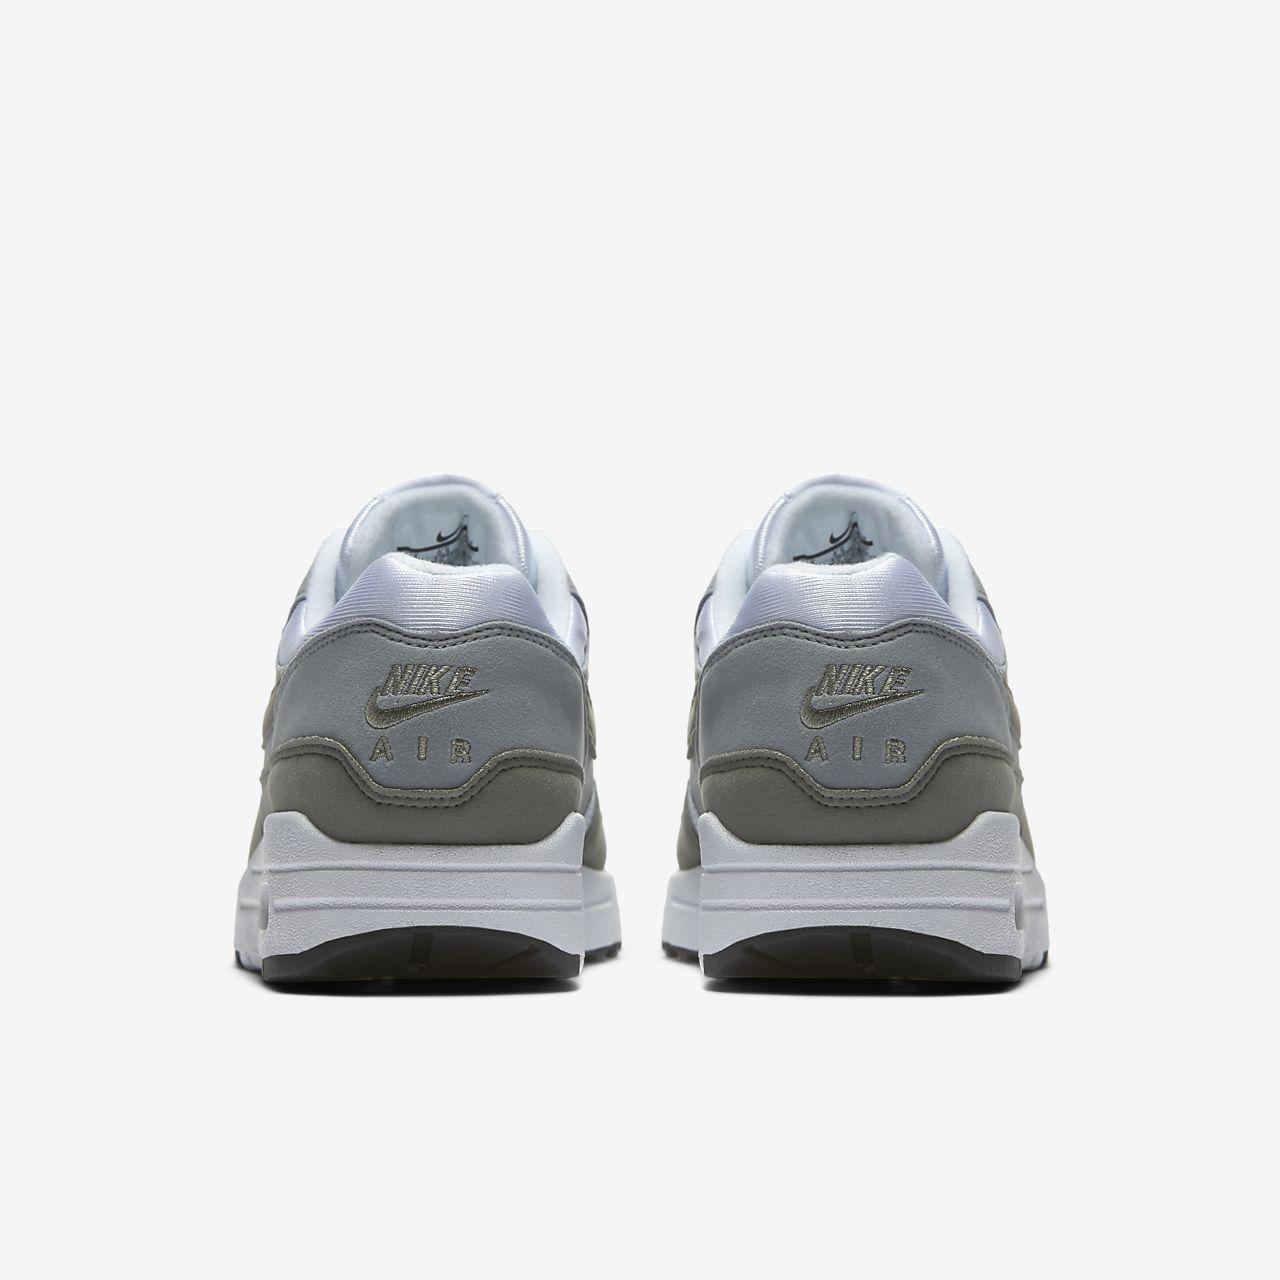 Air Zoom Flyknit Sans Peur - Chaussures - Bas-tops Et Baskets Nike 8trTDhSa5N